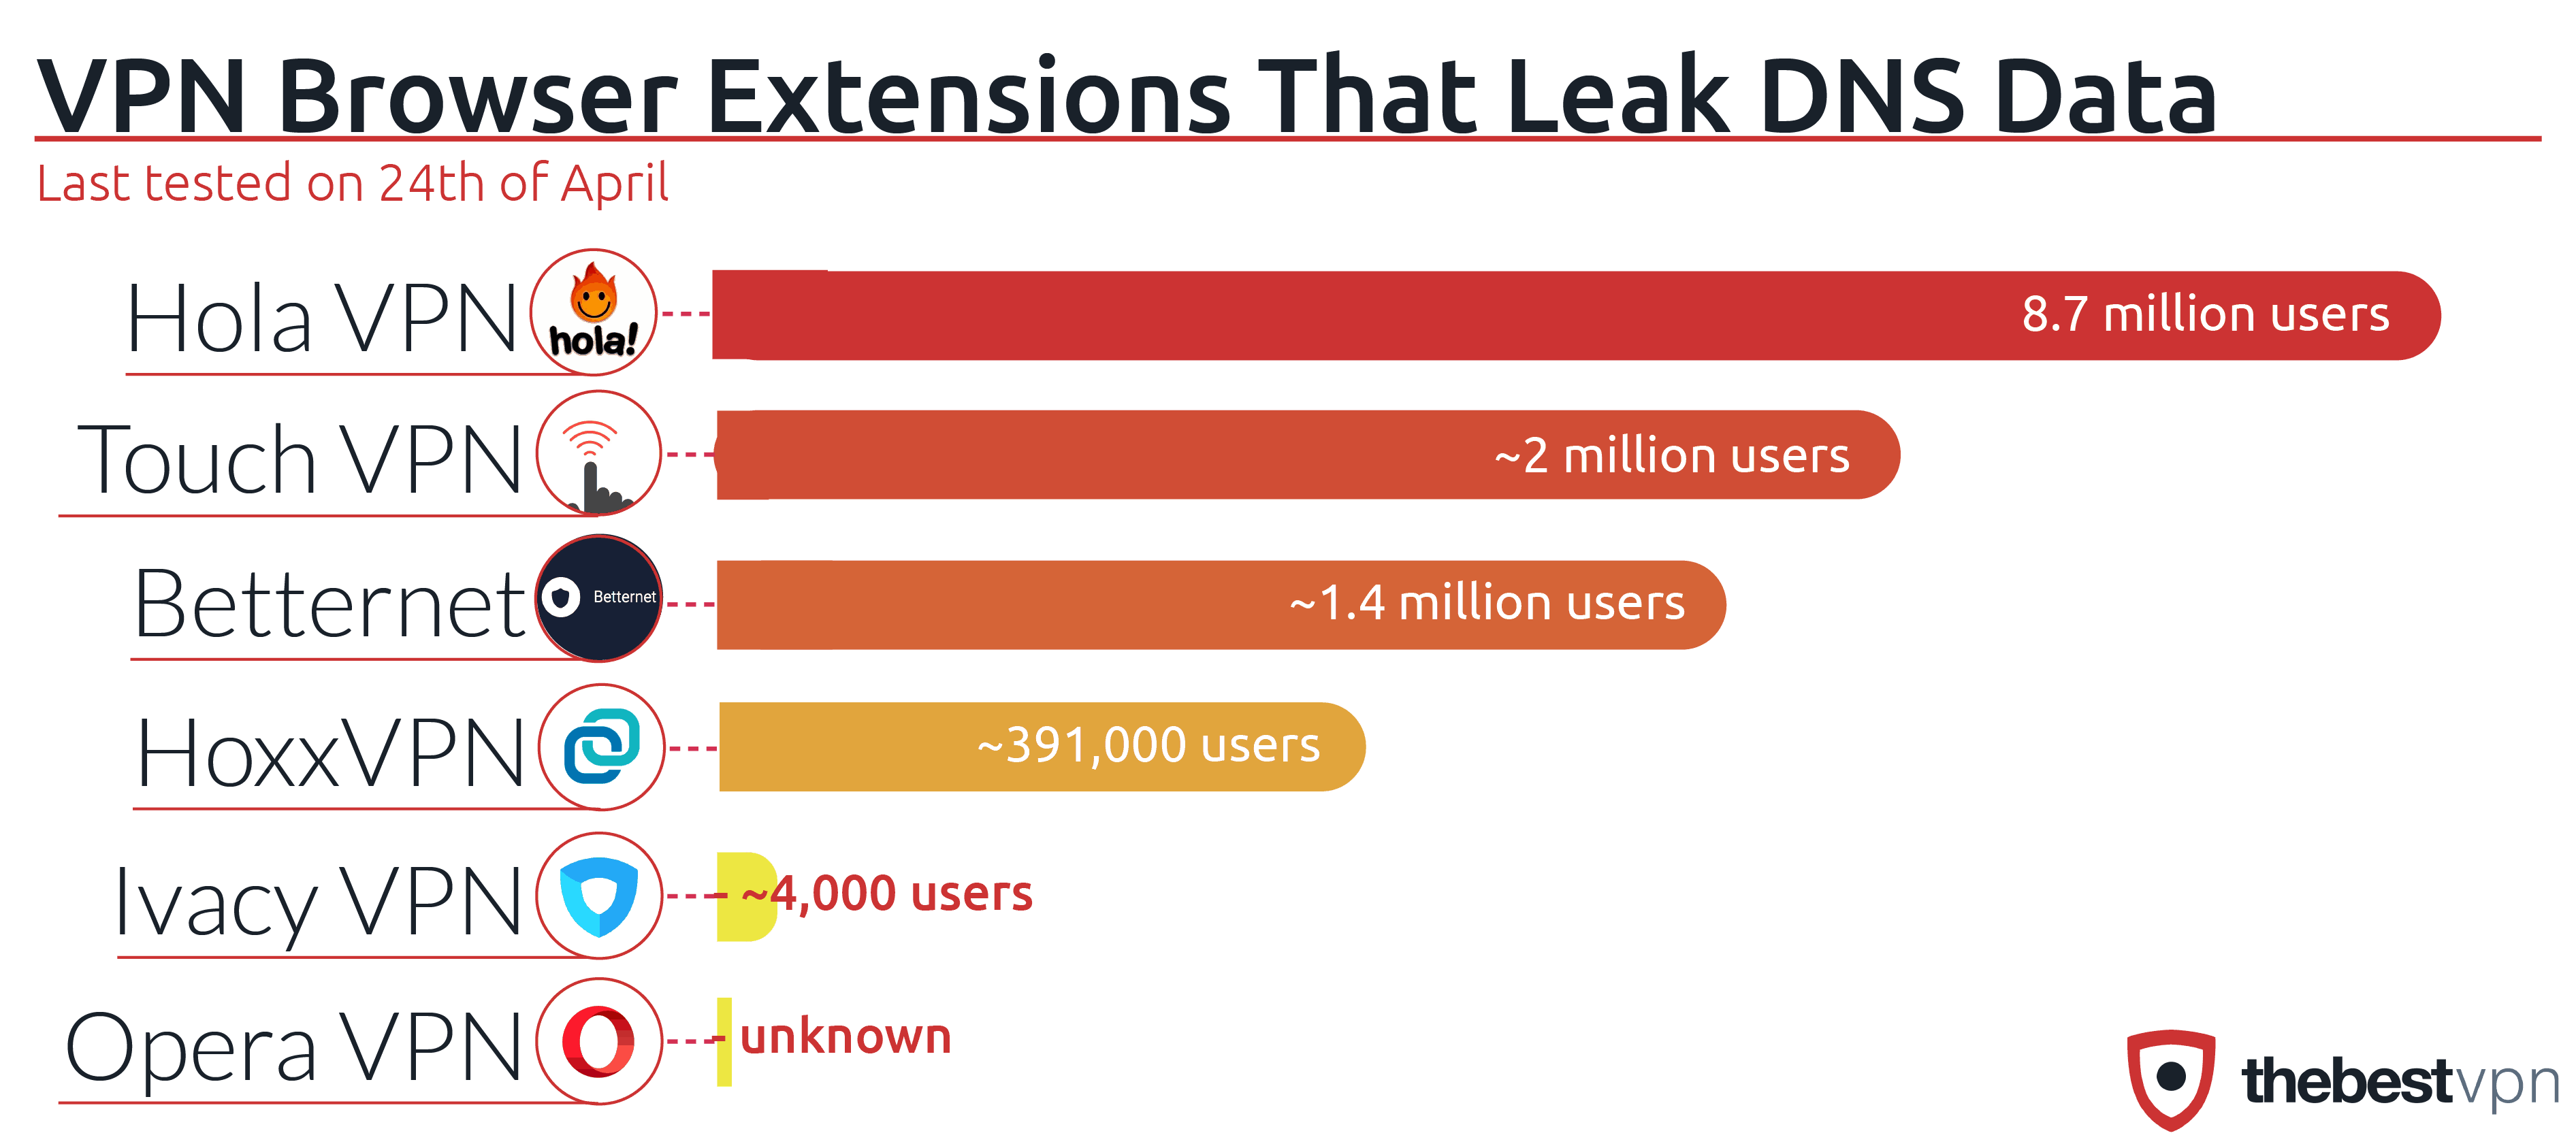 VPN browser extenstions that leak DNS data